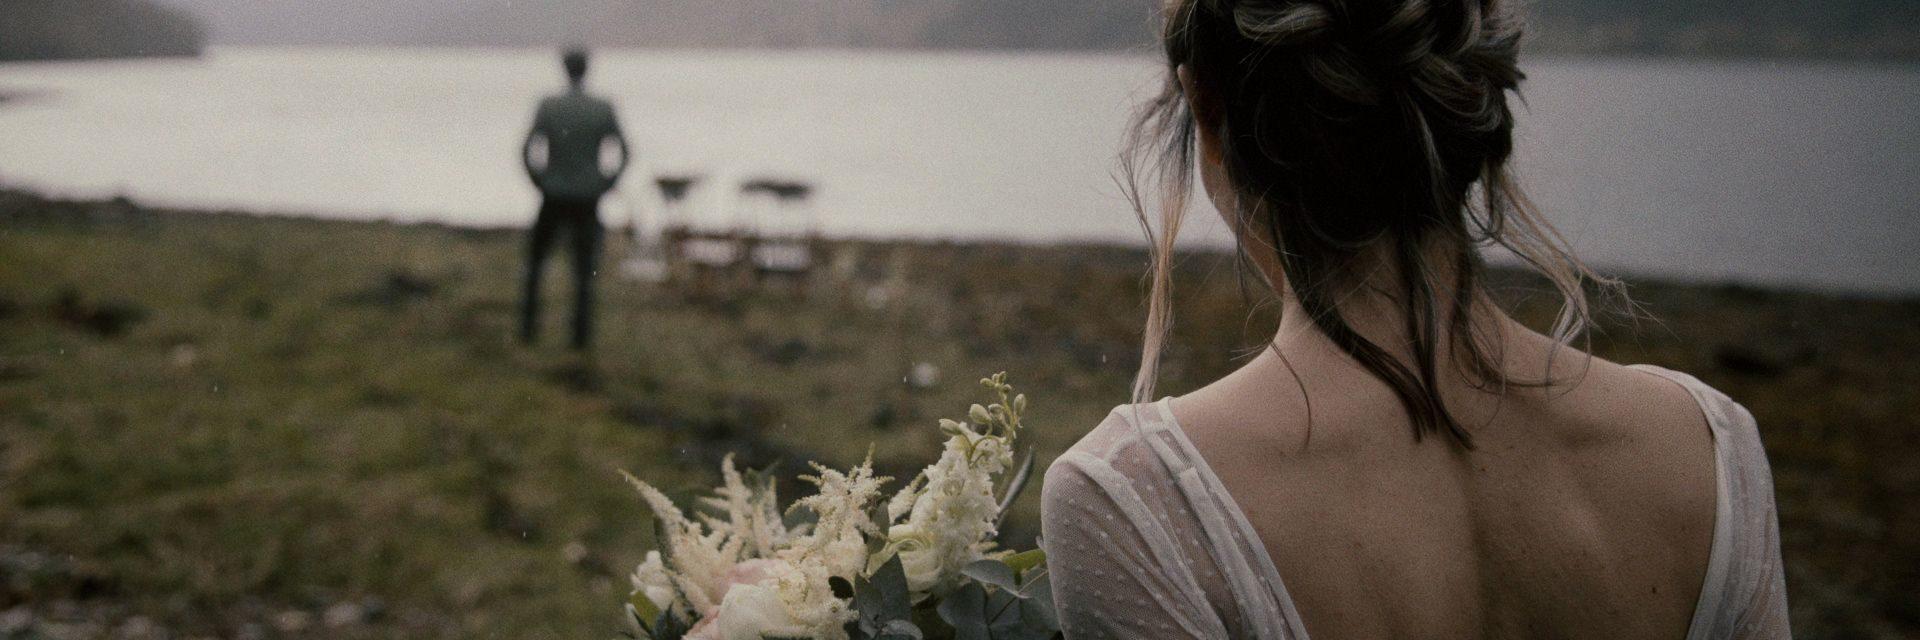 Glencoe-elopement-videographer-cinemate-films-02